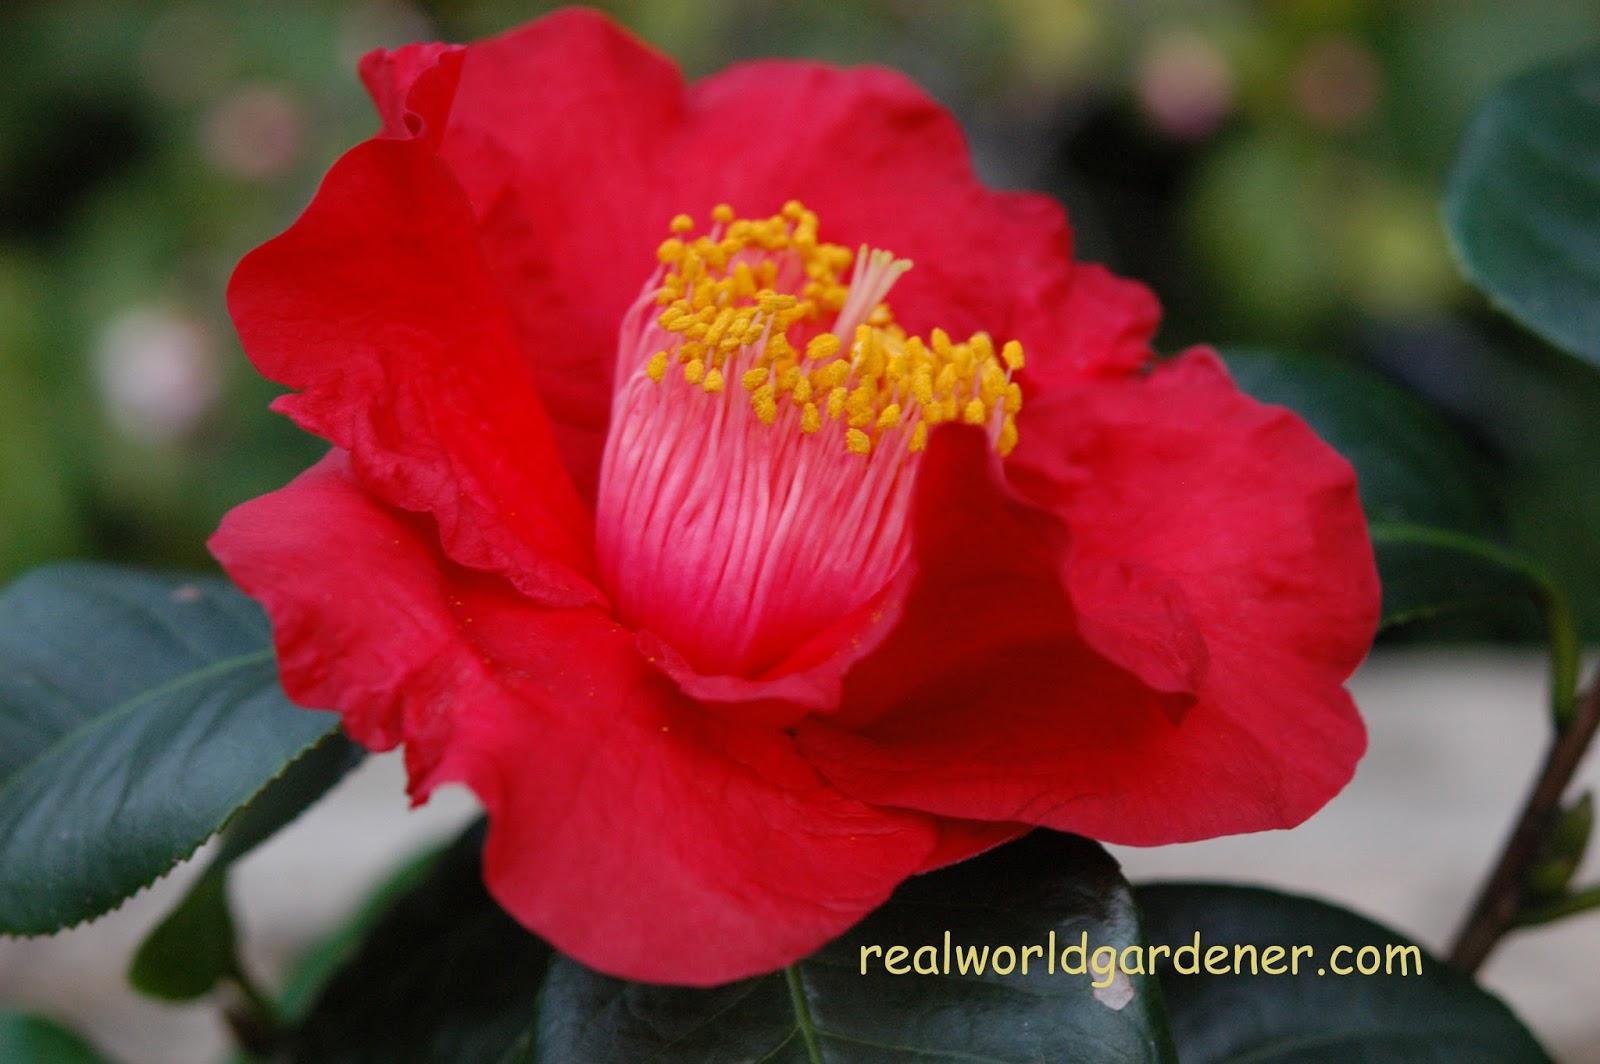 Real World Gardener Edoble Flowers In Plant Of The Week